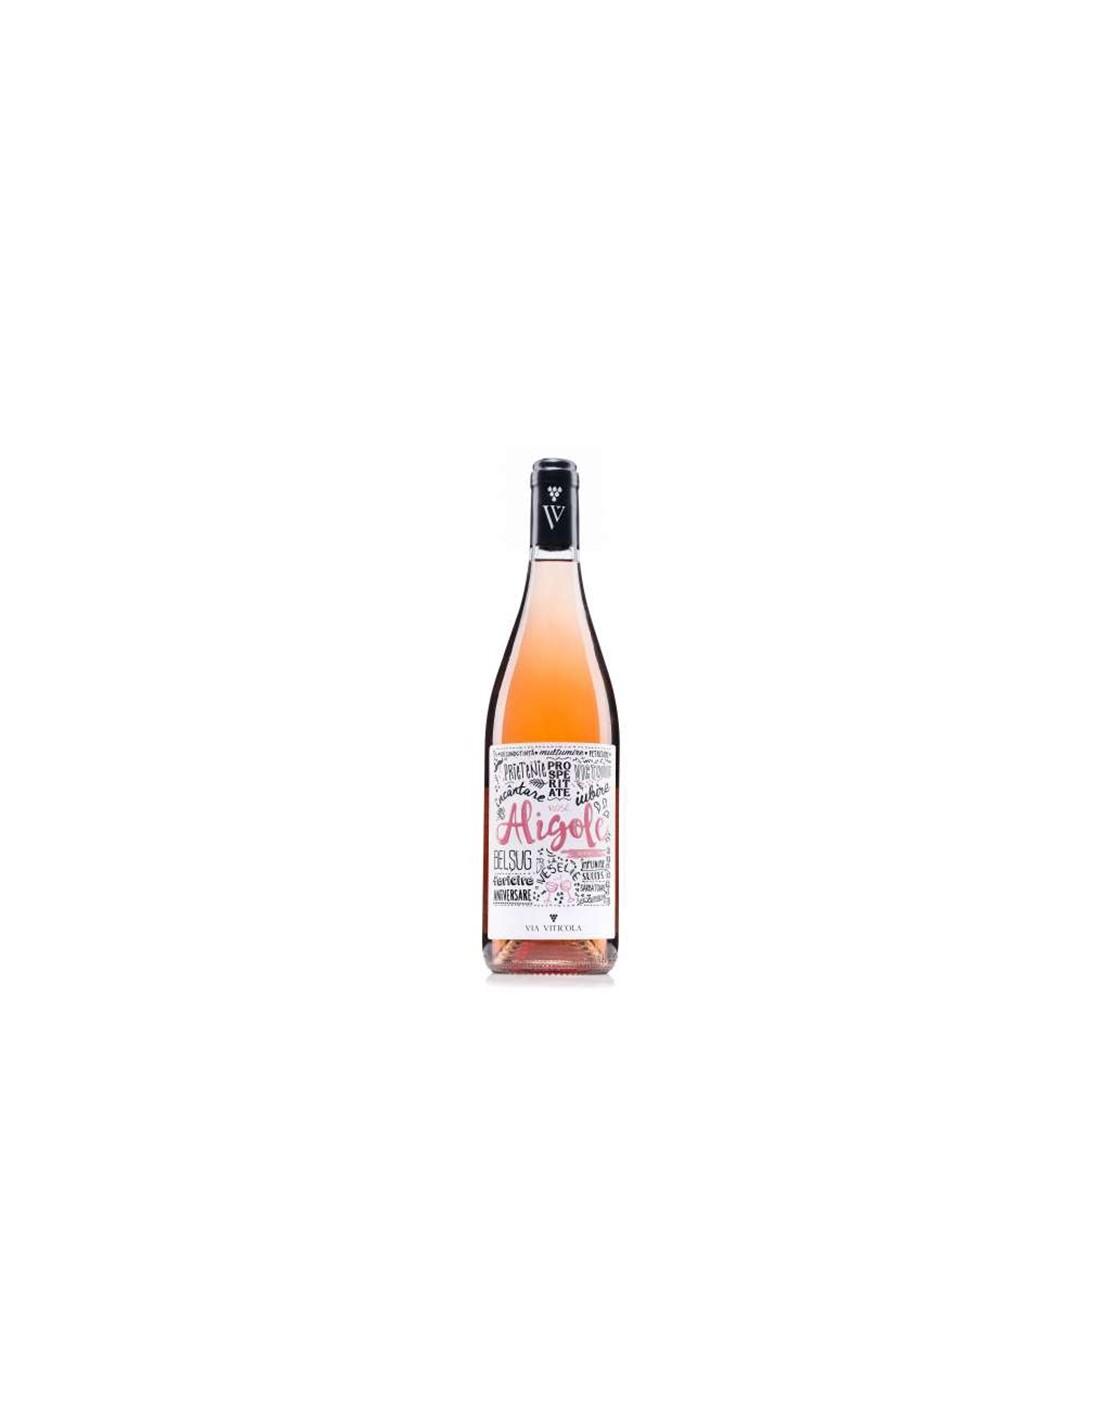 Vin roze demisec, Cupaj, Aligole Dealurile Dobrogei, 0.75L, 13.5% alc., Romania